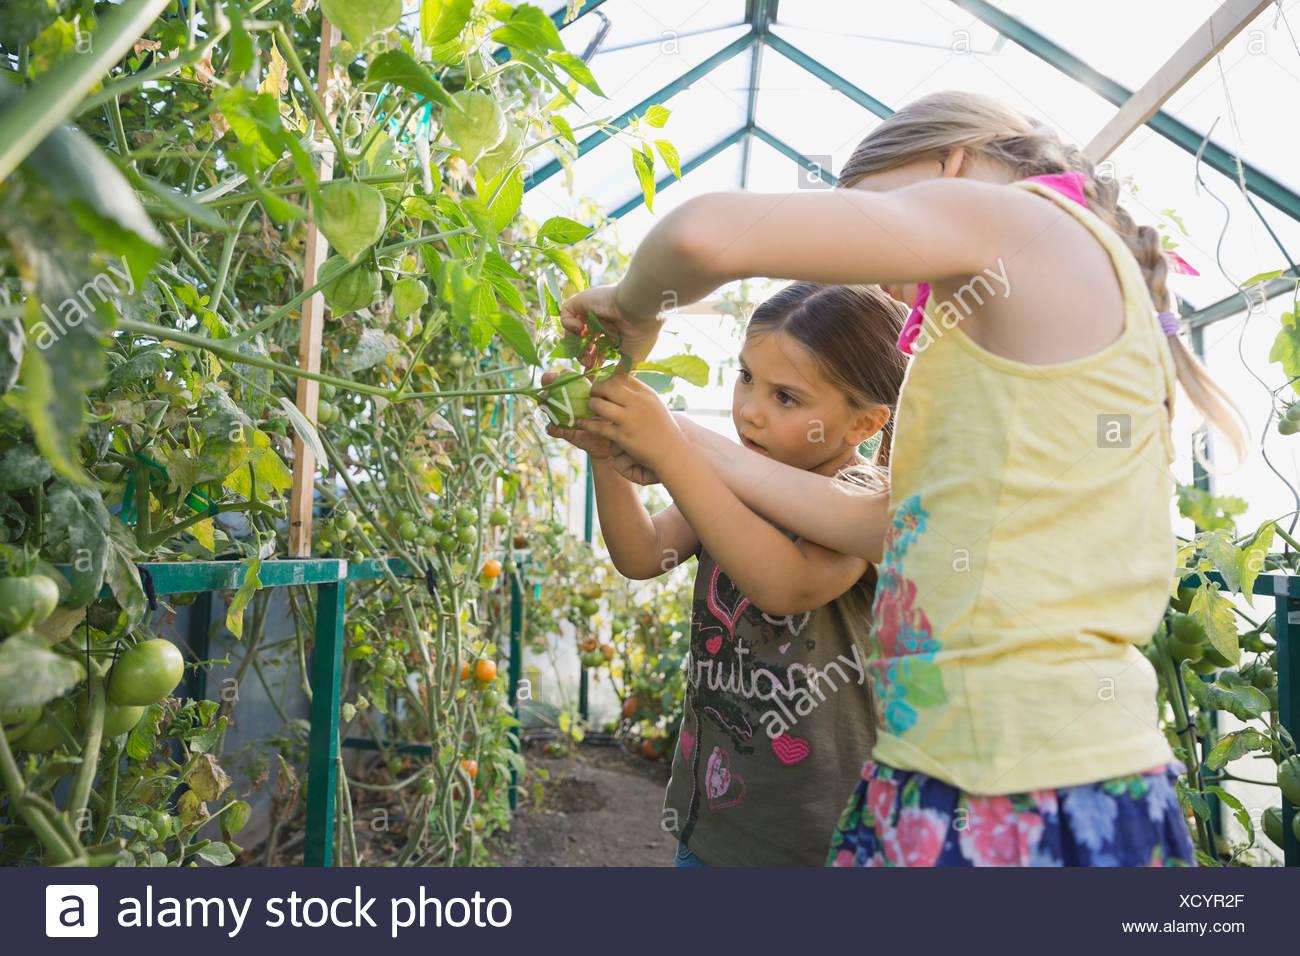 Little girls analyzing flower in community greenhouse - Stock Image